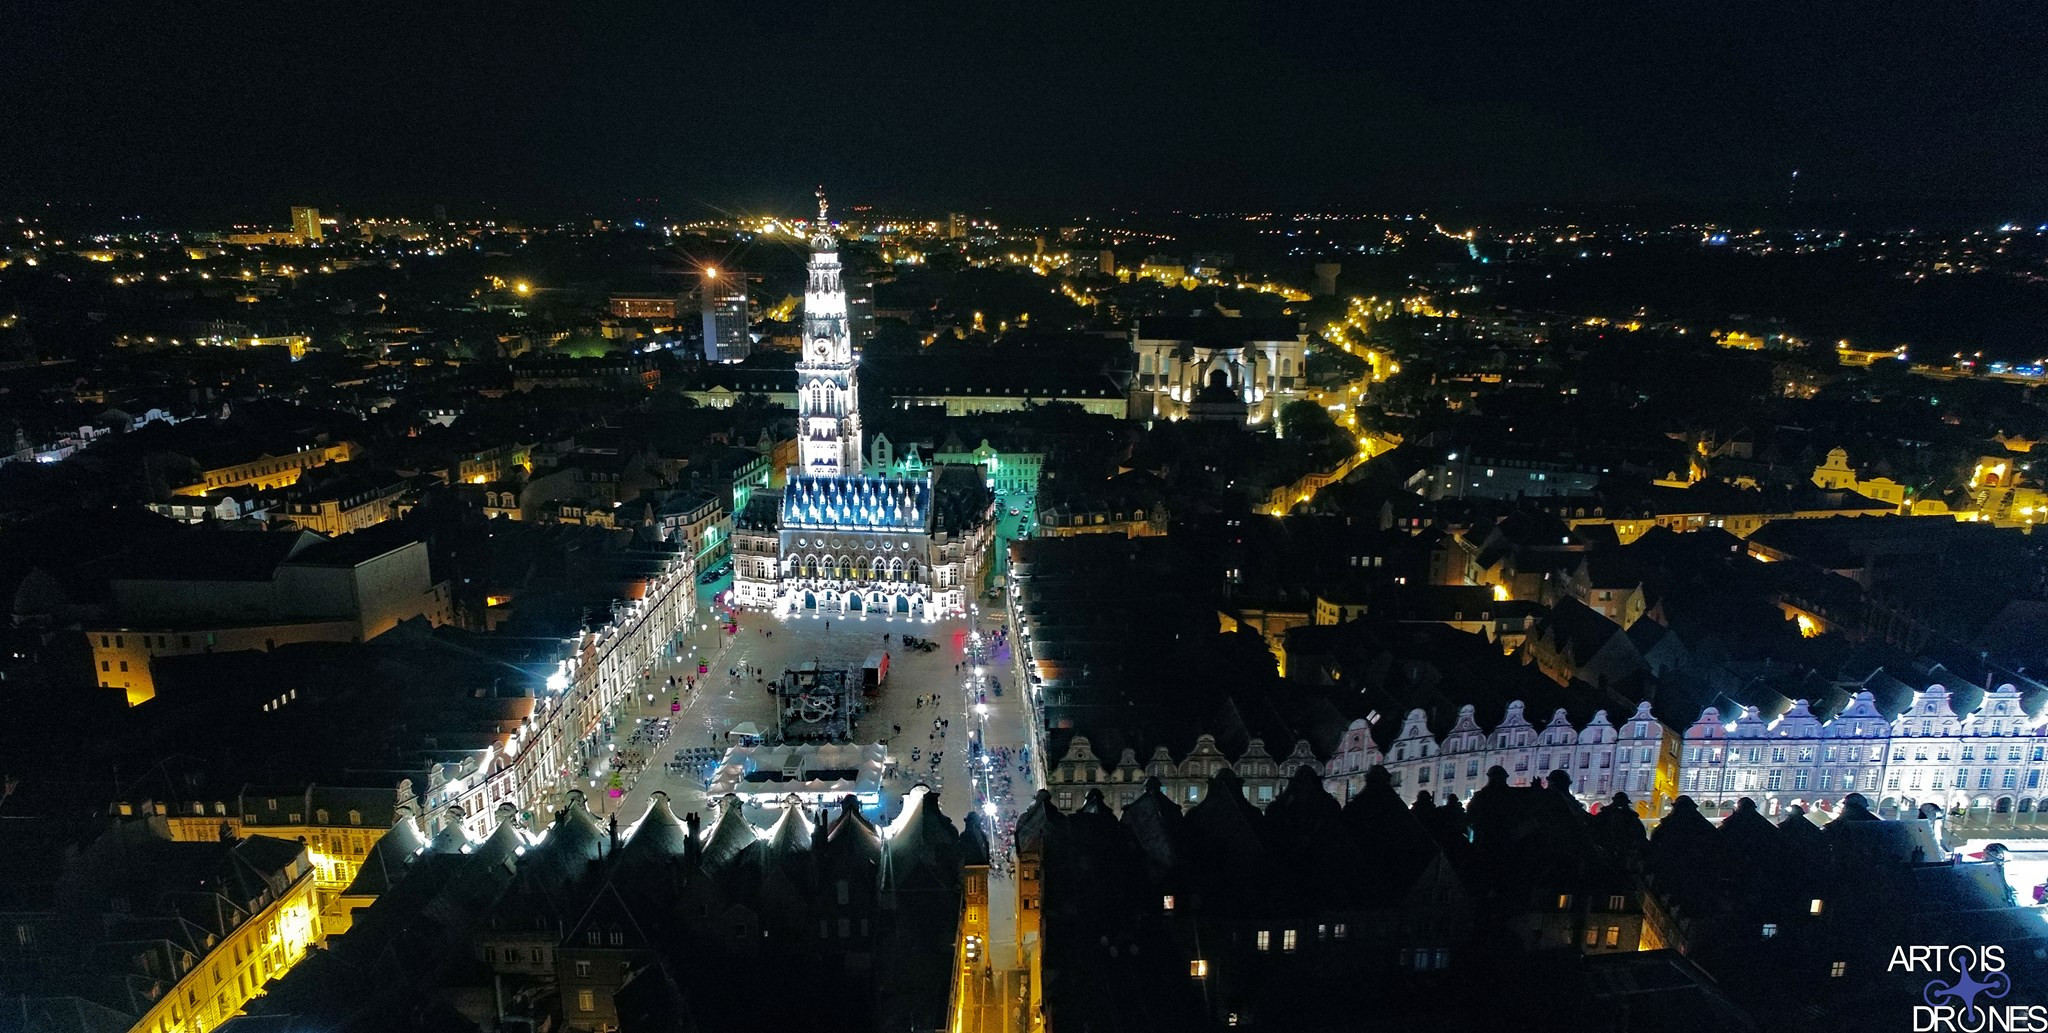 Embrasement Beffoir Arras Septembre 2017 Artois Drones